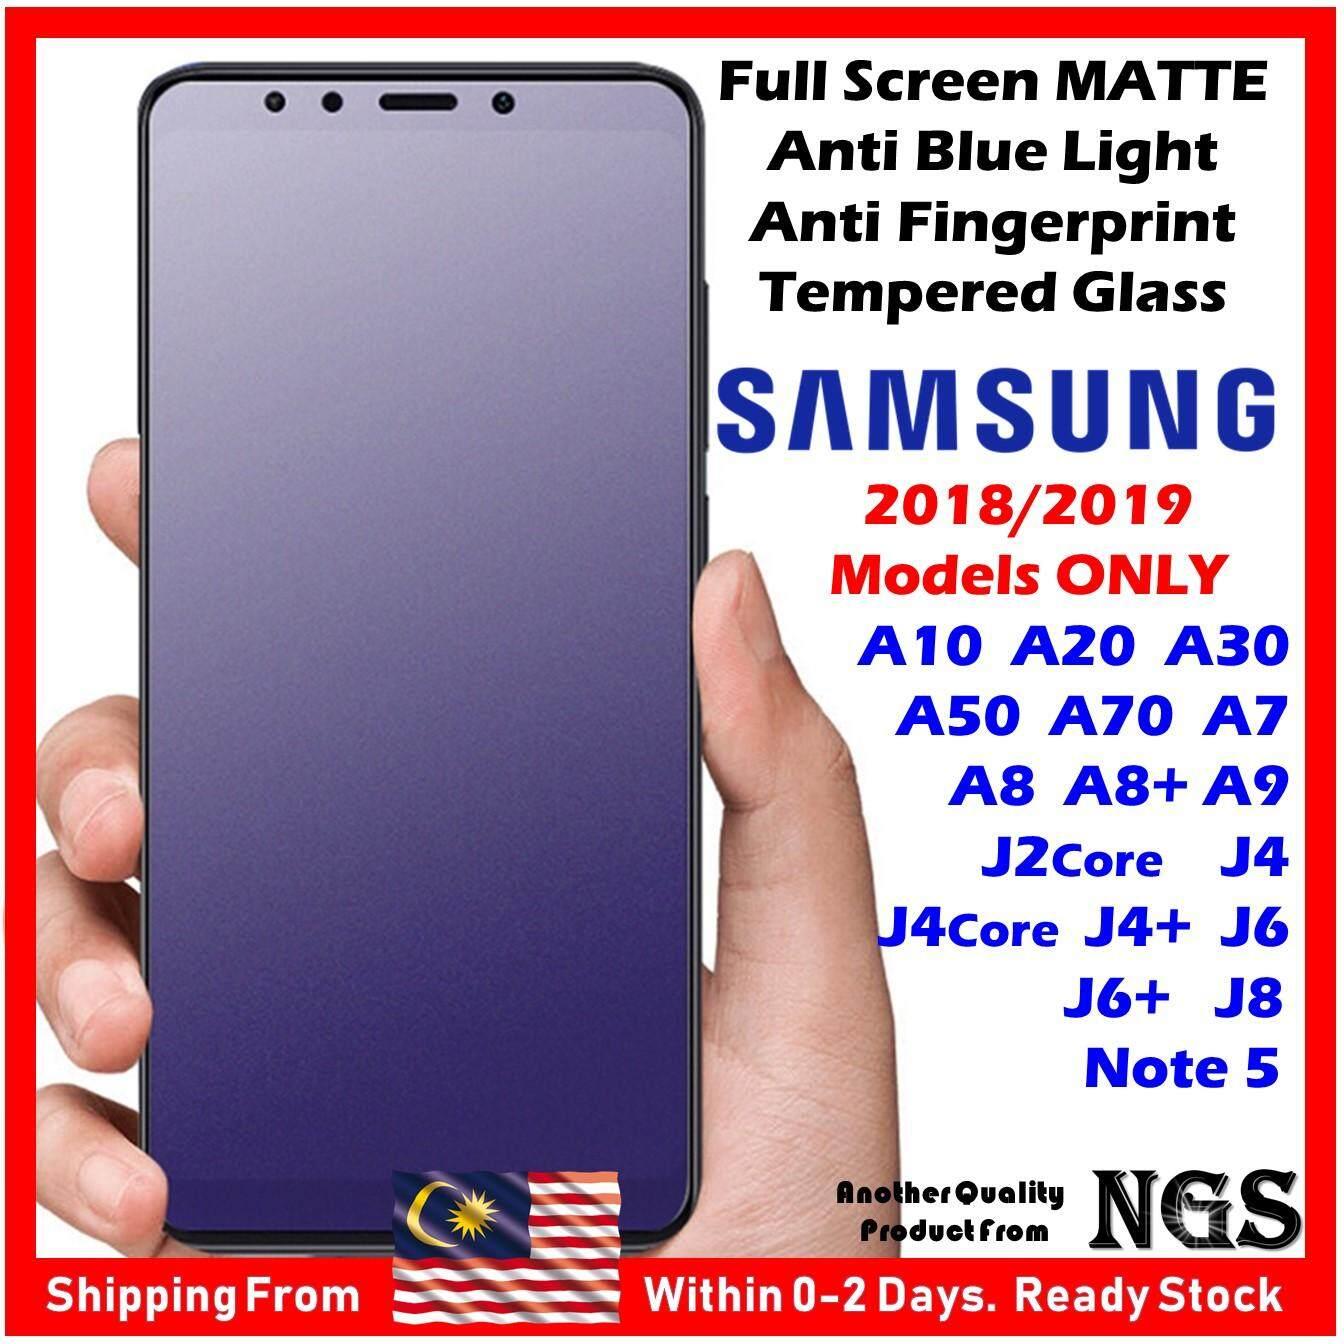 Full Screen Blue Light Anti Fingerprint MATTE Tempered Glass FOR SAMSUNG  Note 5 A10 A20 A30 A50 A70 A7 A8 A8+ A9 J2 Core J4 J4+ J4 CoreJ6 J8